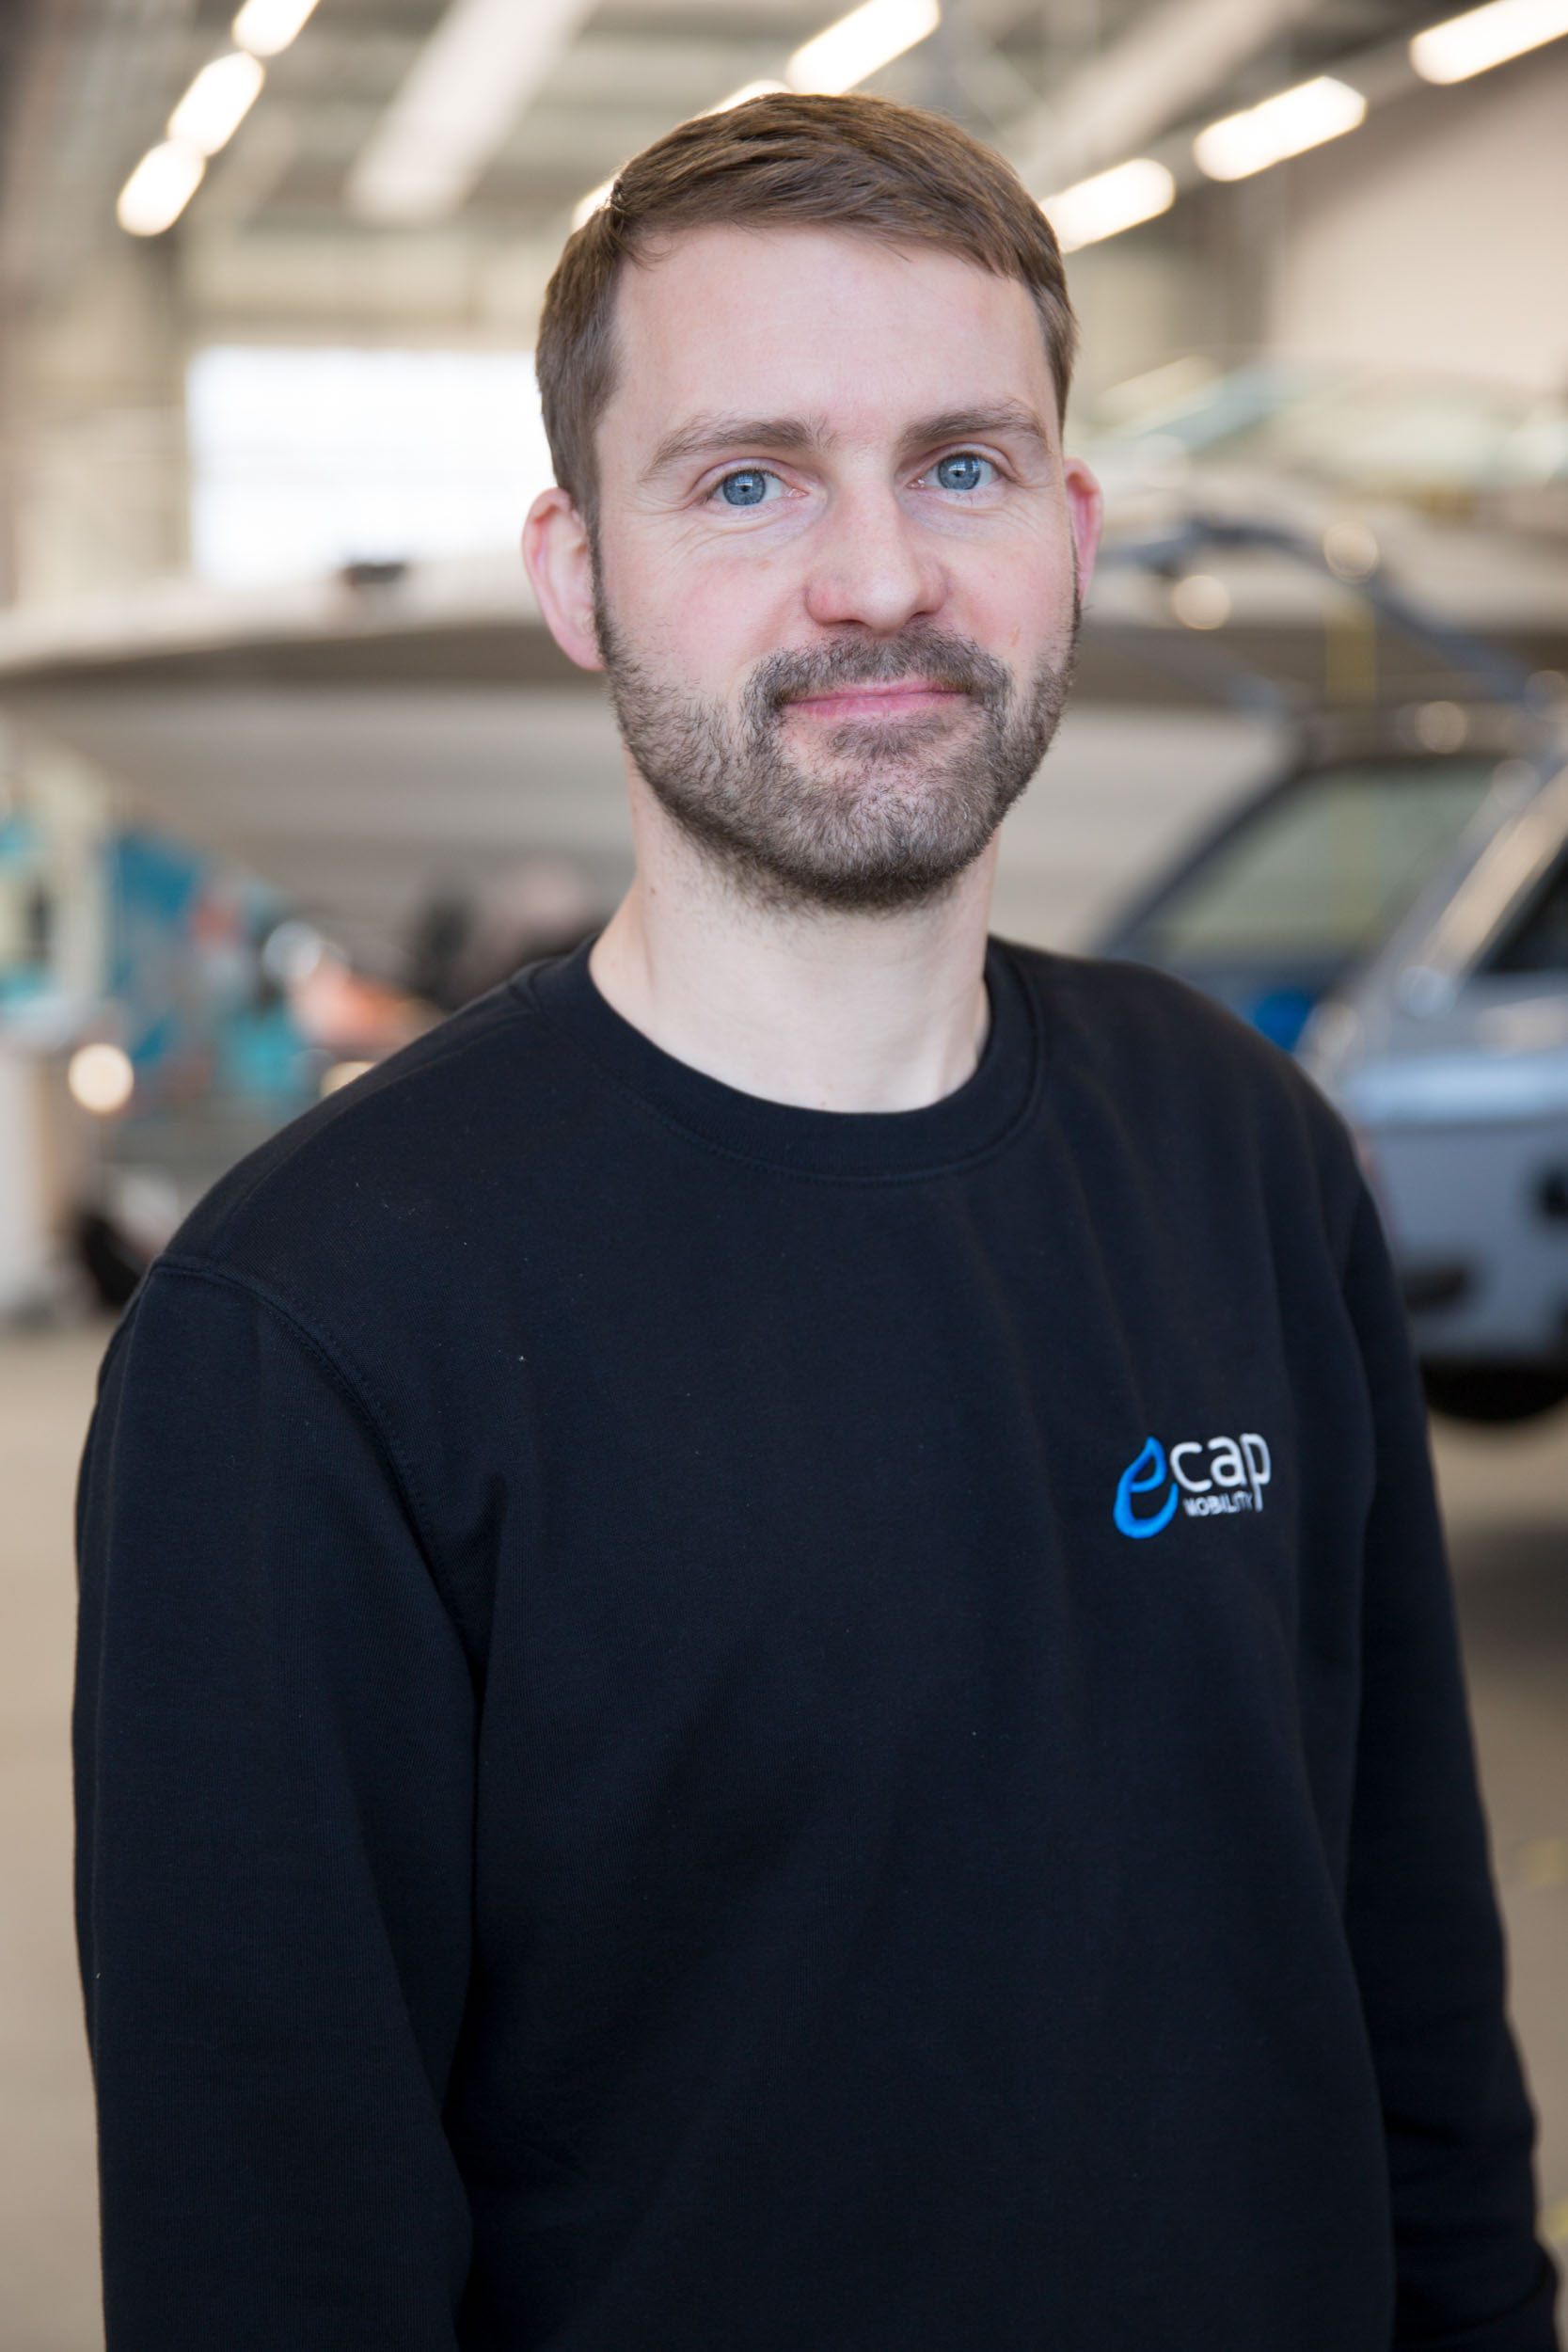 Lars Ewert | Kfz-Meister  lew@ecap-mobility.com